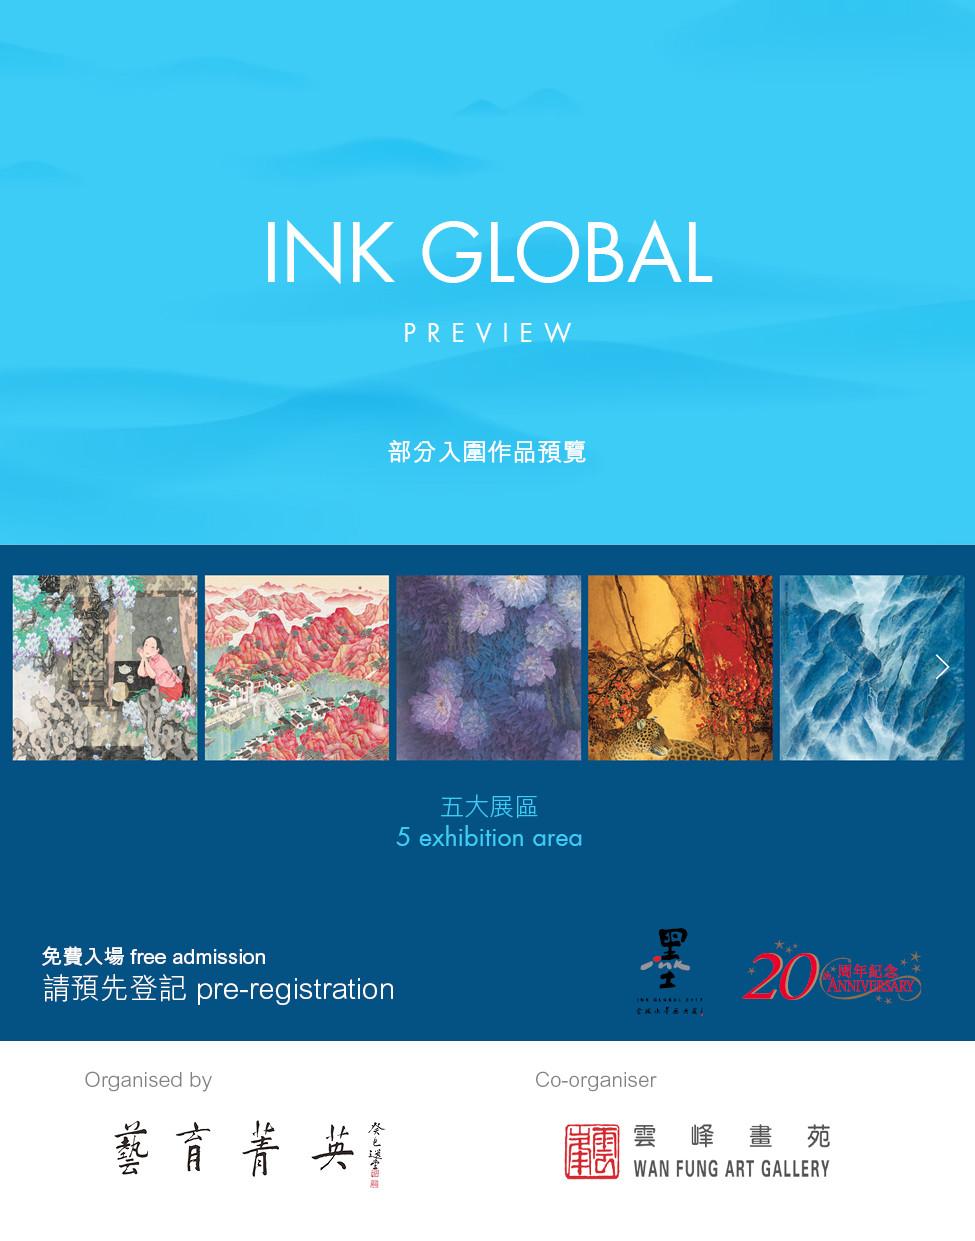 Ink Global